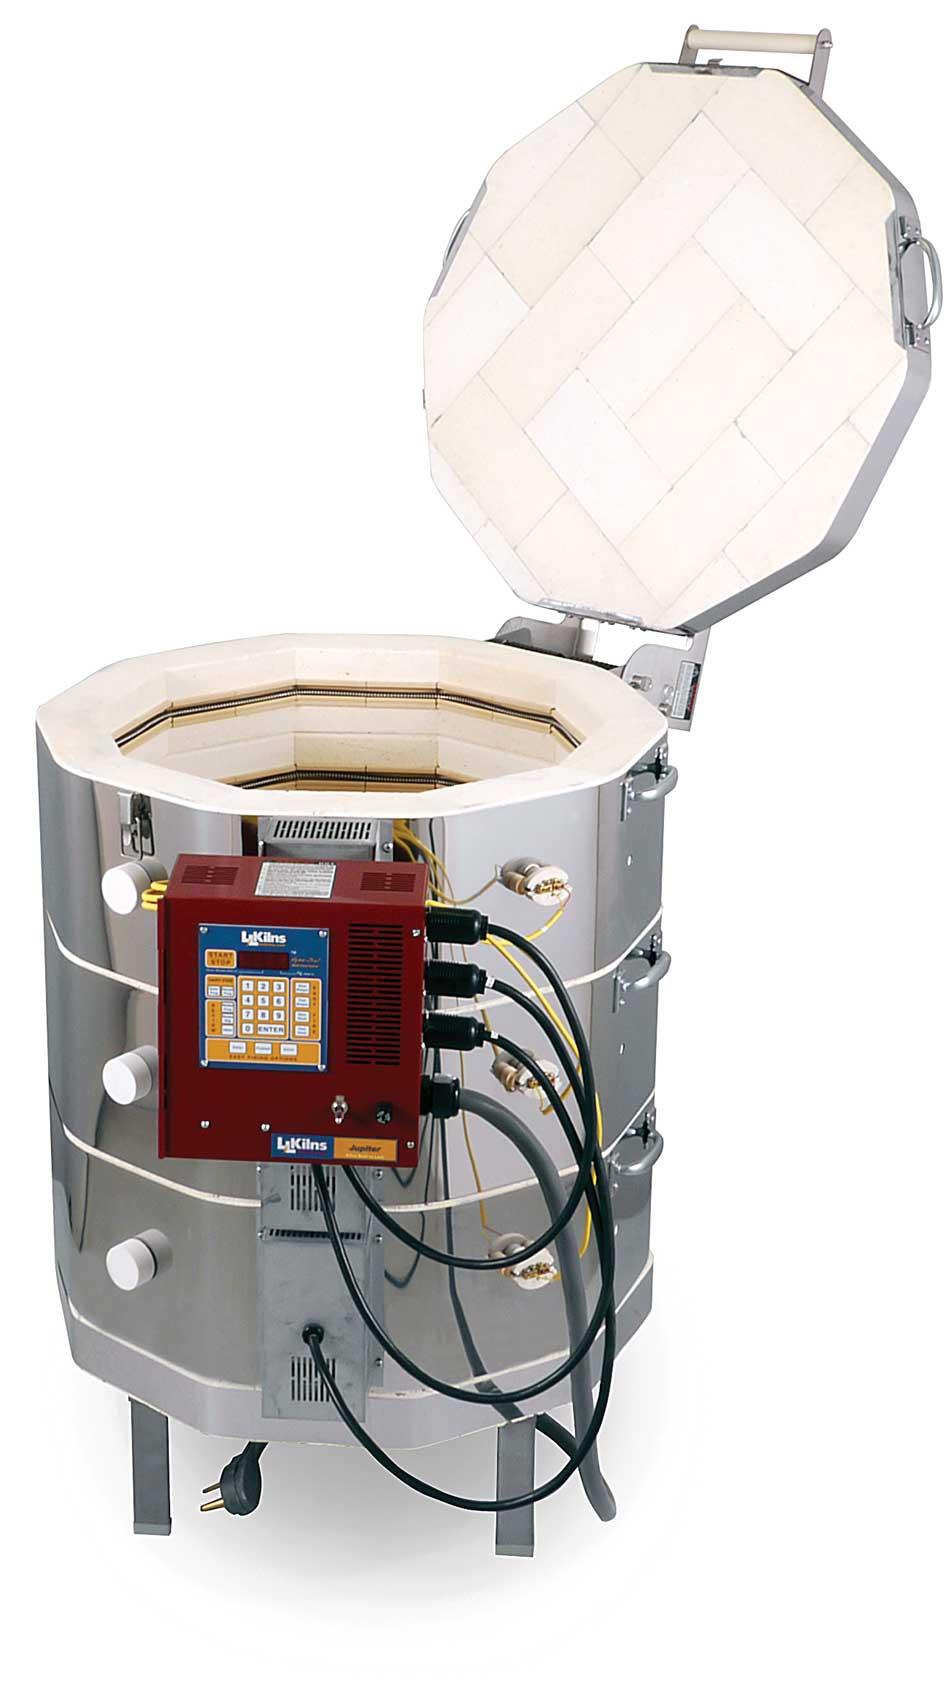 Ll Electric Kilns Pid Controller Wiring Diagram 230v Jd230 Ez Kiln